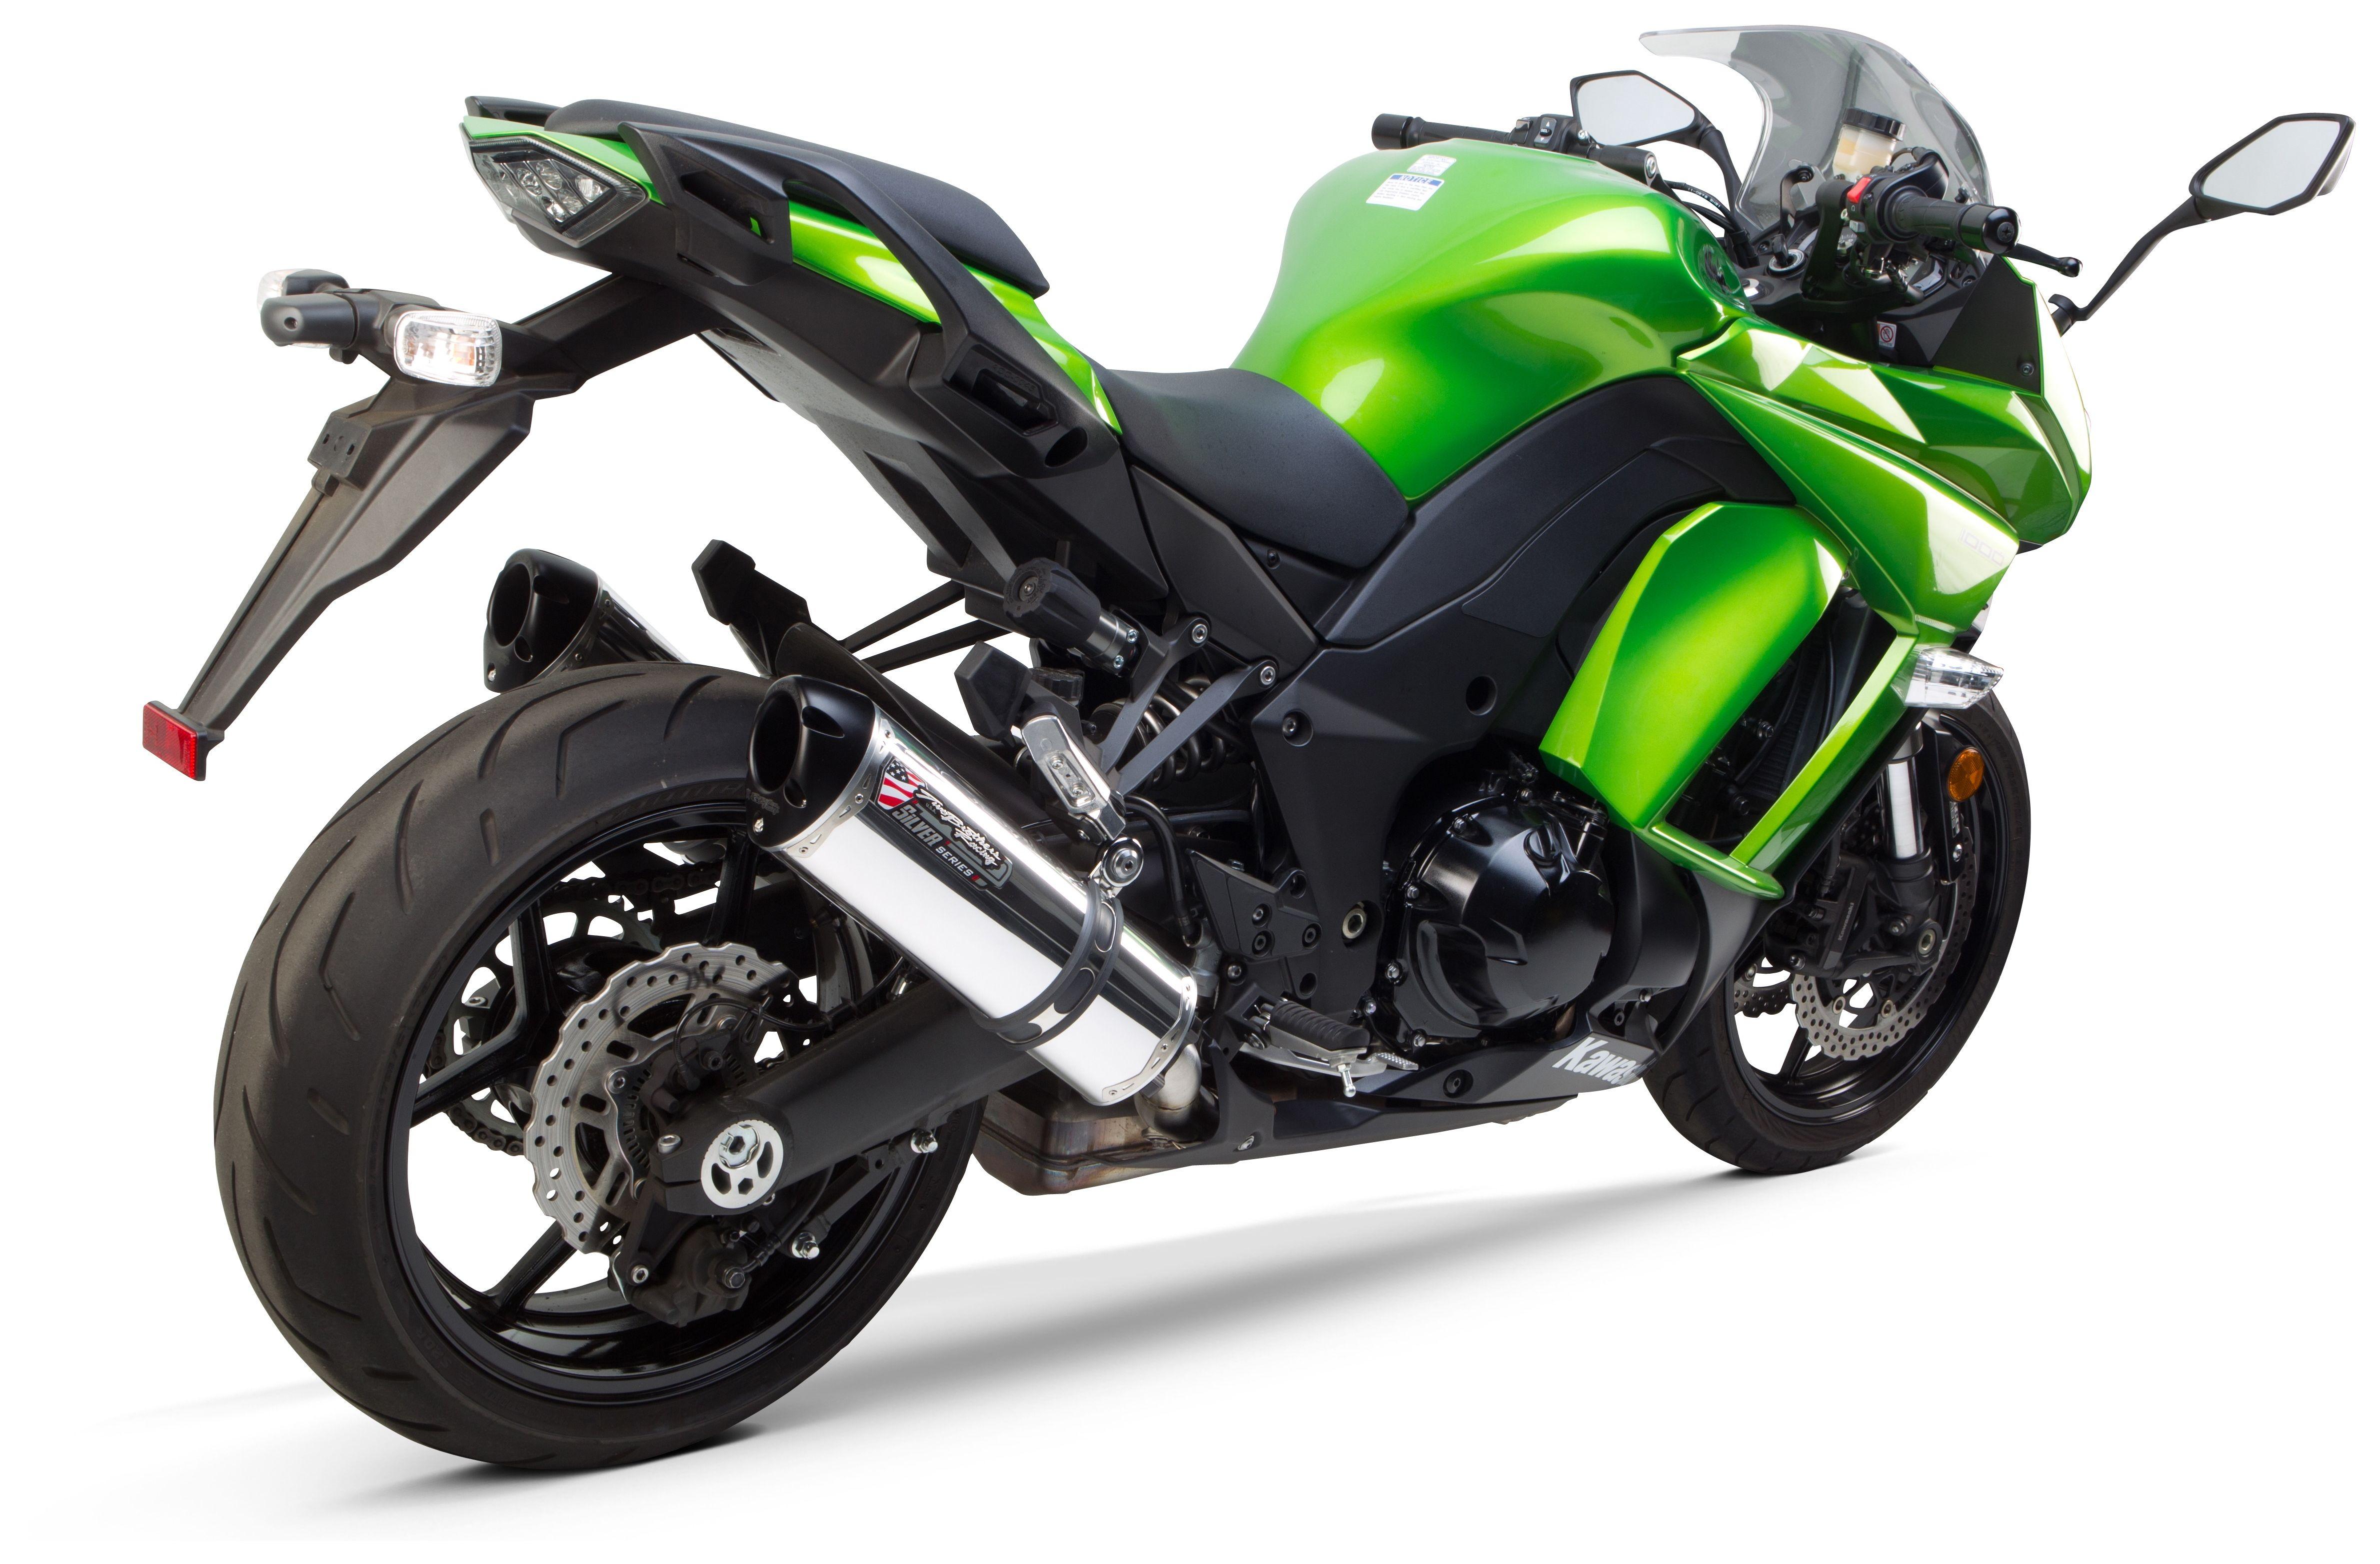 Kawasaki ninja zx r fuse box location attack